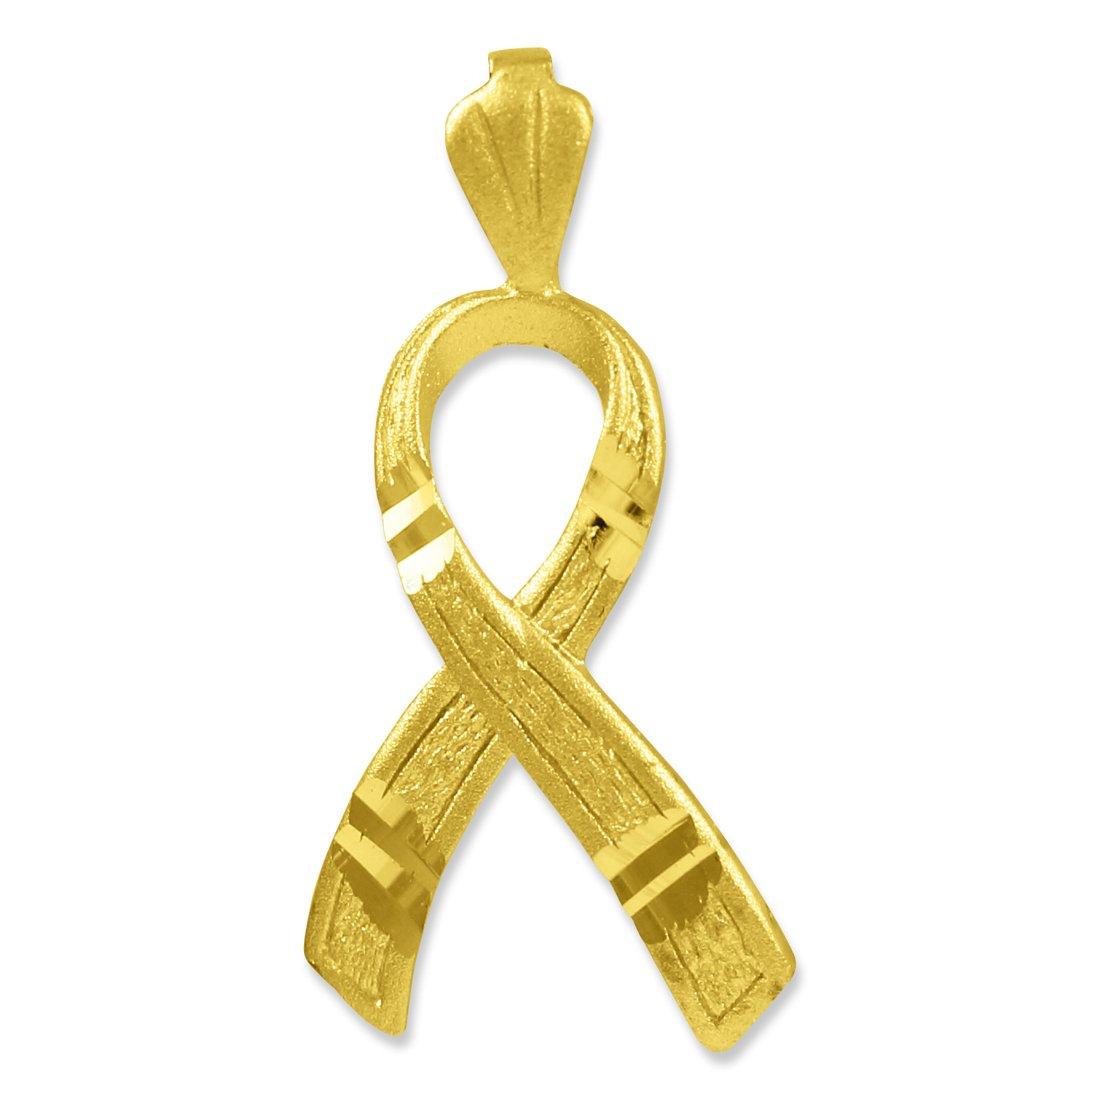 14k Gold Childhood Cancer Awareness Ribbon Charm 3D Pendant